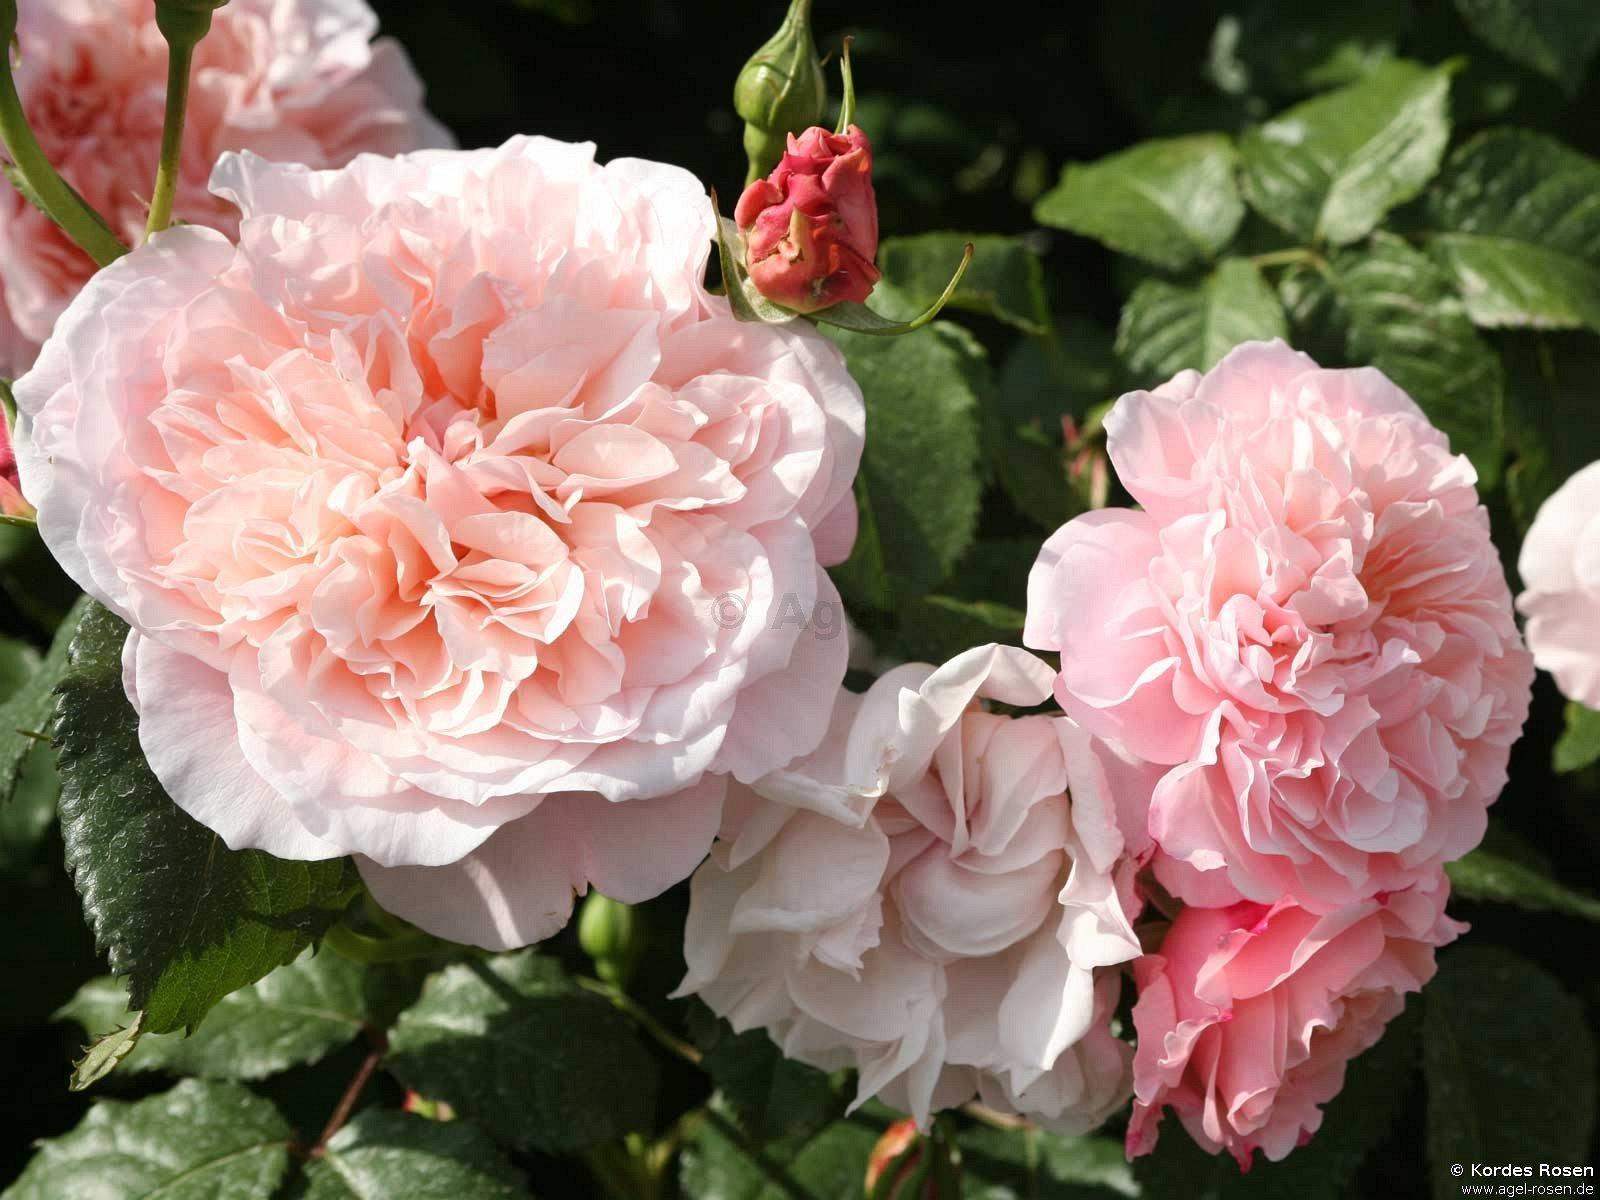 rose de tolbiac kletterrose kaufen bei agel rosen. Black Bedroom Furniture Sets. Home Design Ideas